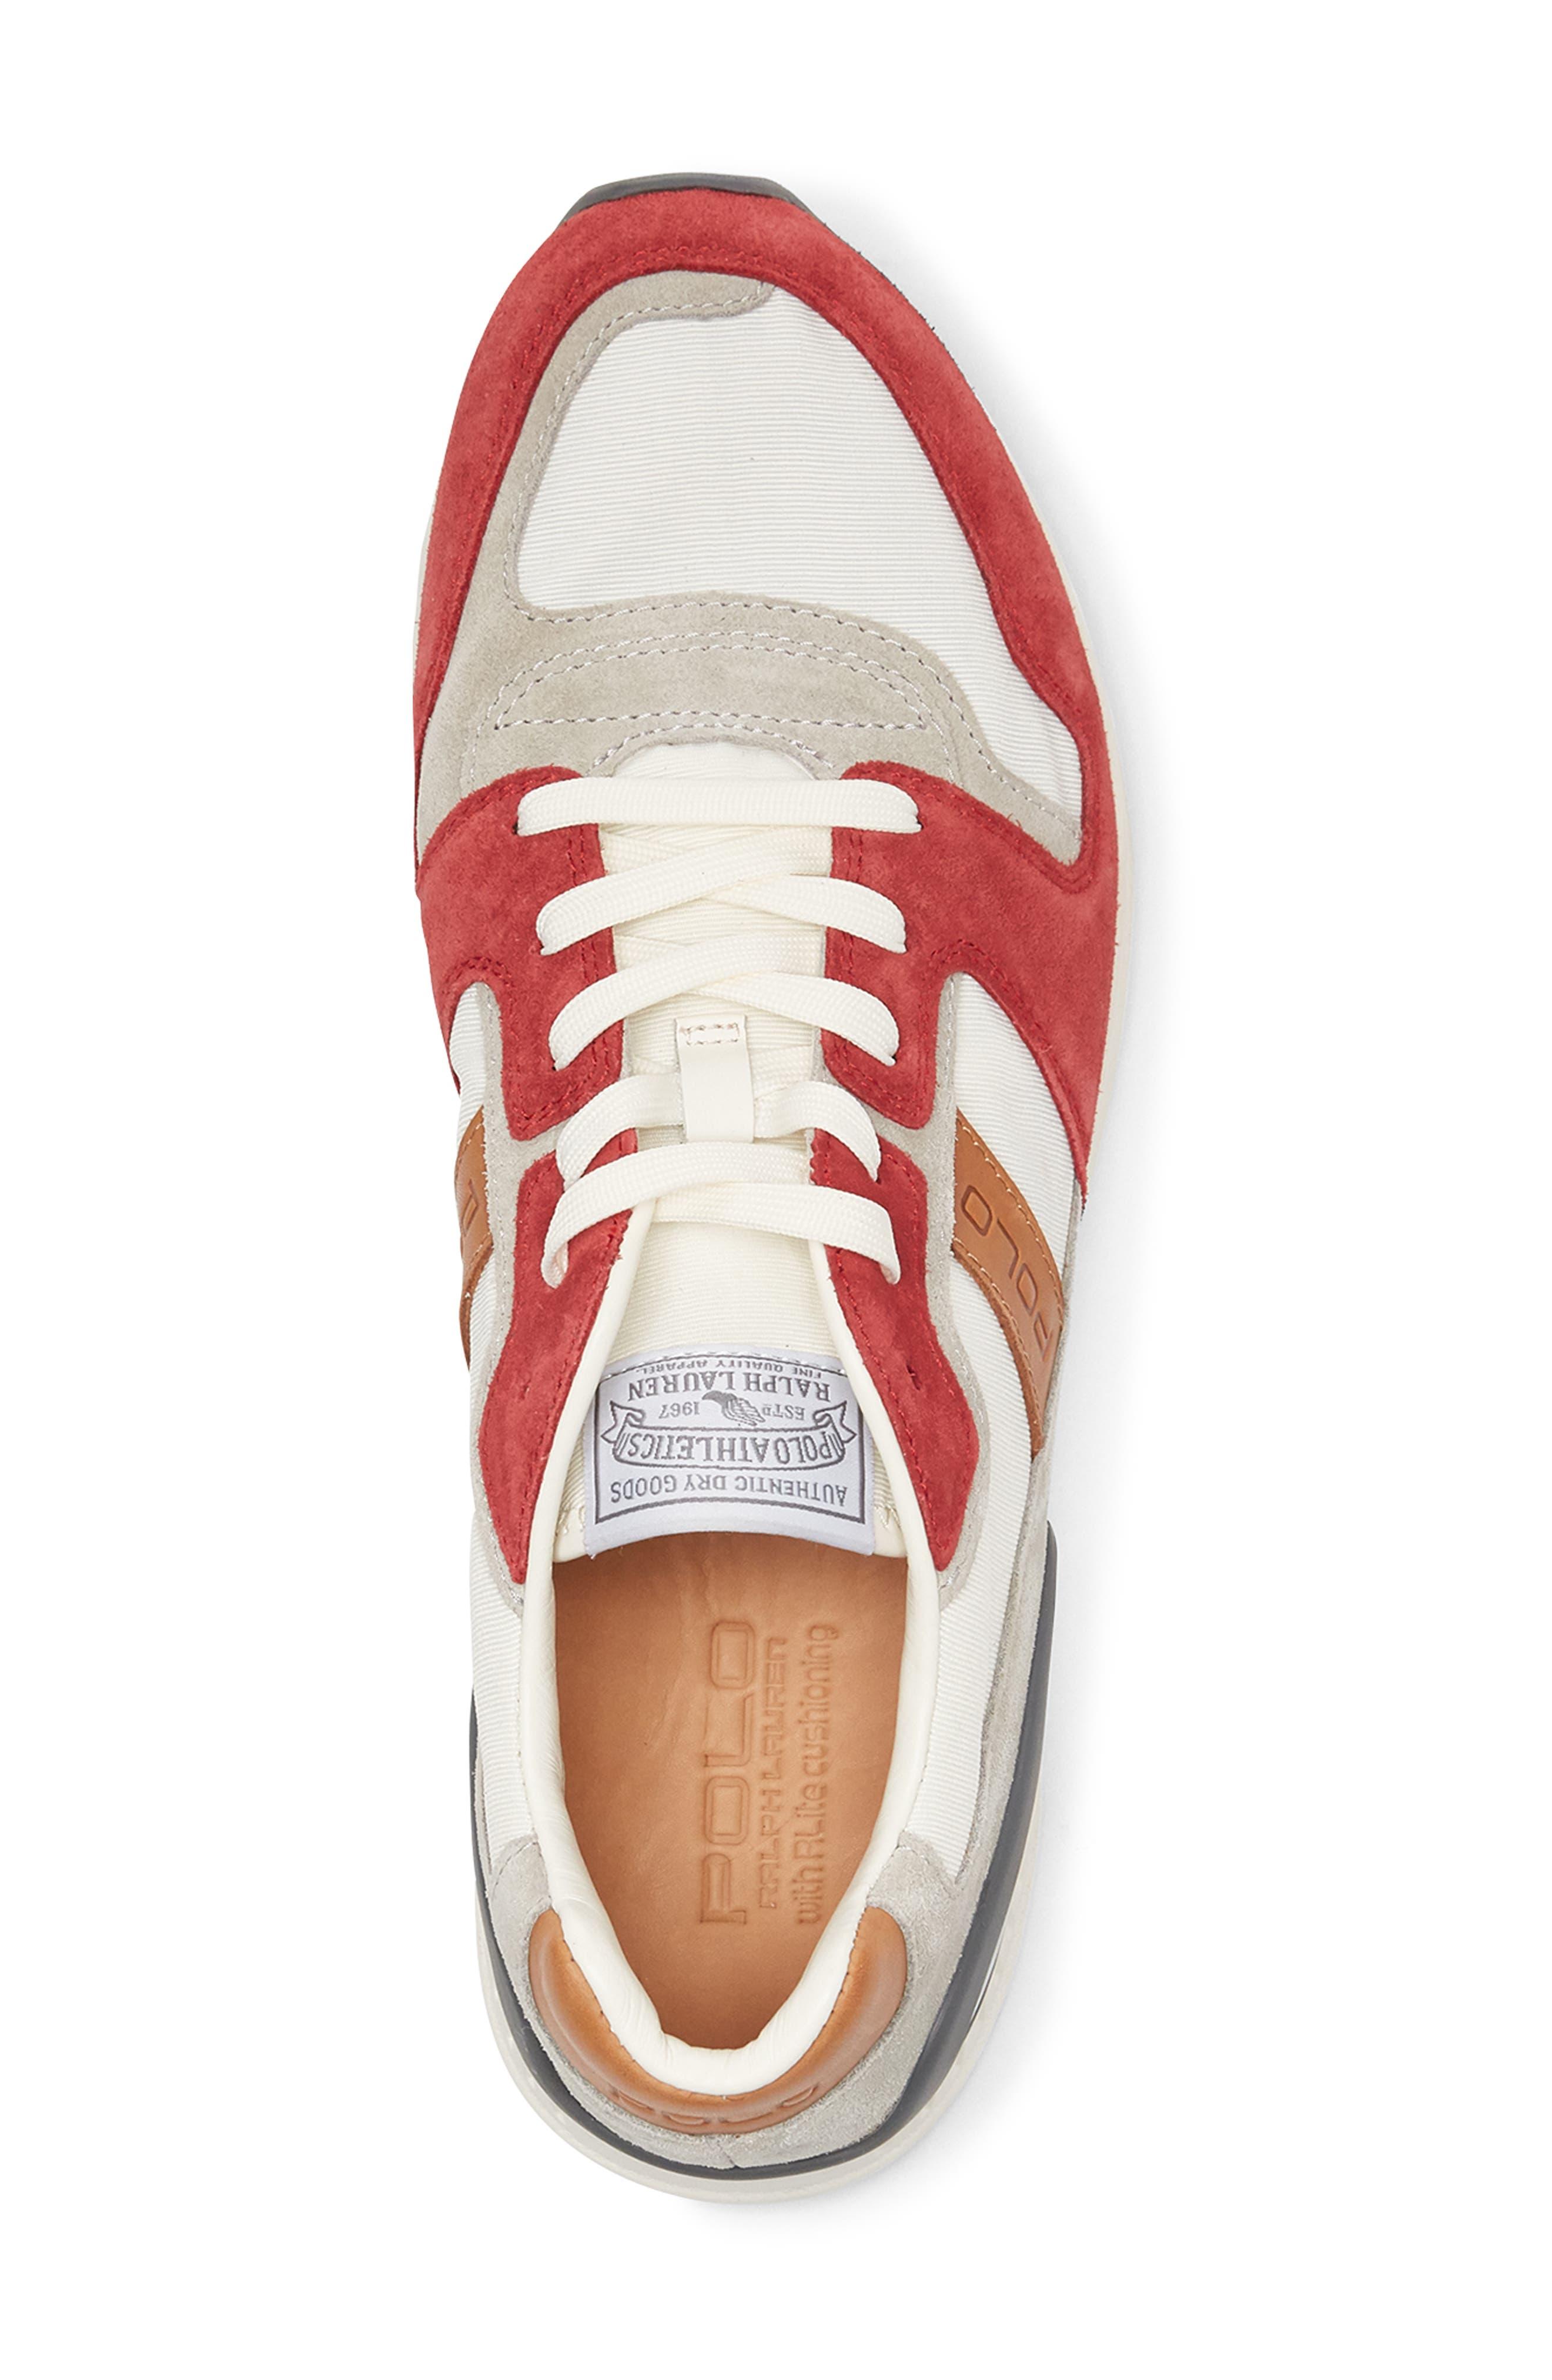 POLO RALPH LAUREN, Train 100 Retro Sneaker, Alternate thumbnail 3, color, RED NYLON/ SUEDE